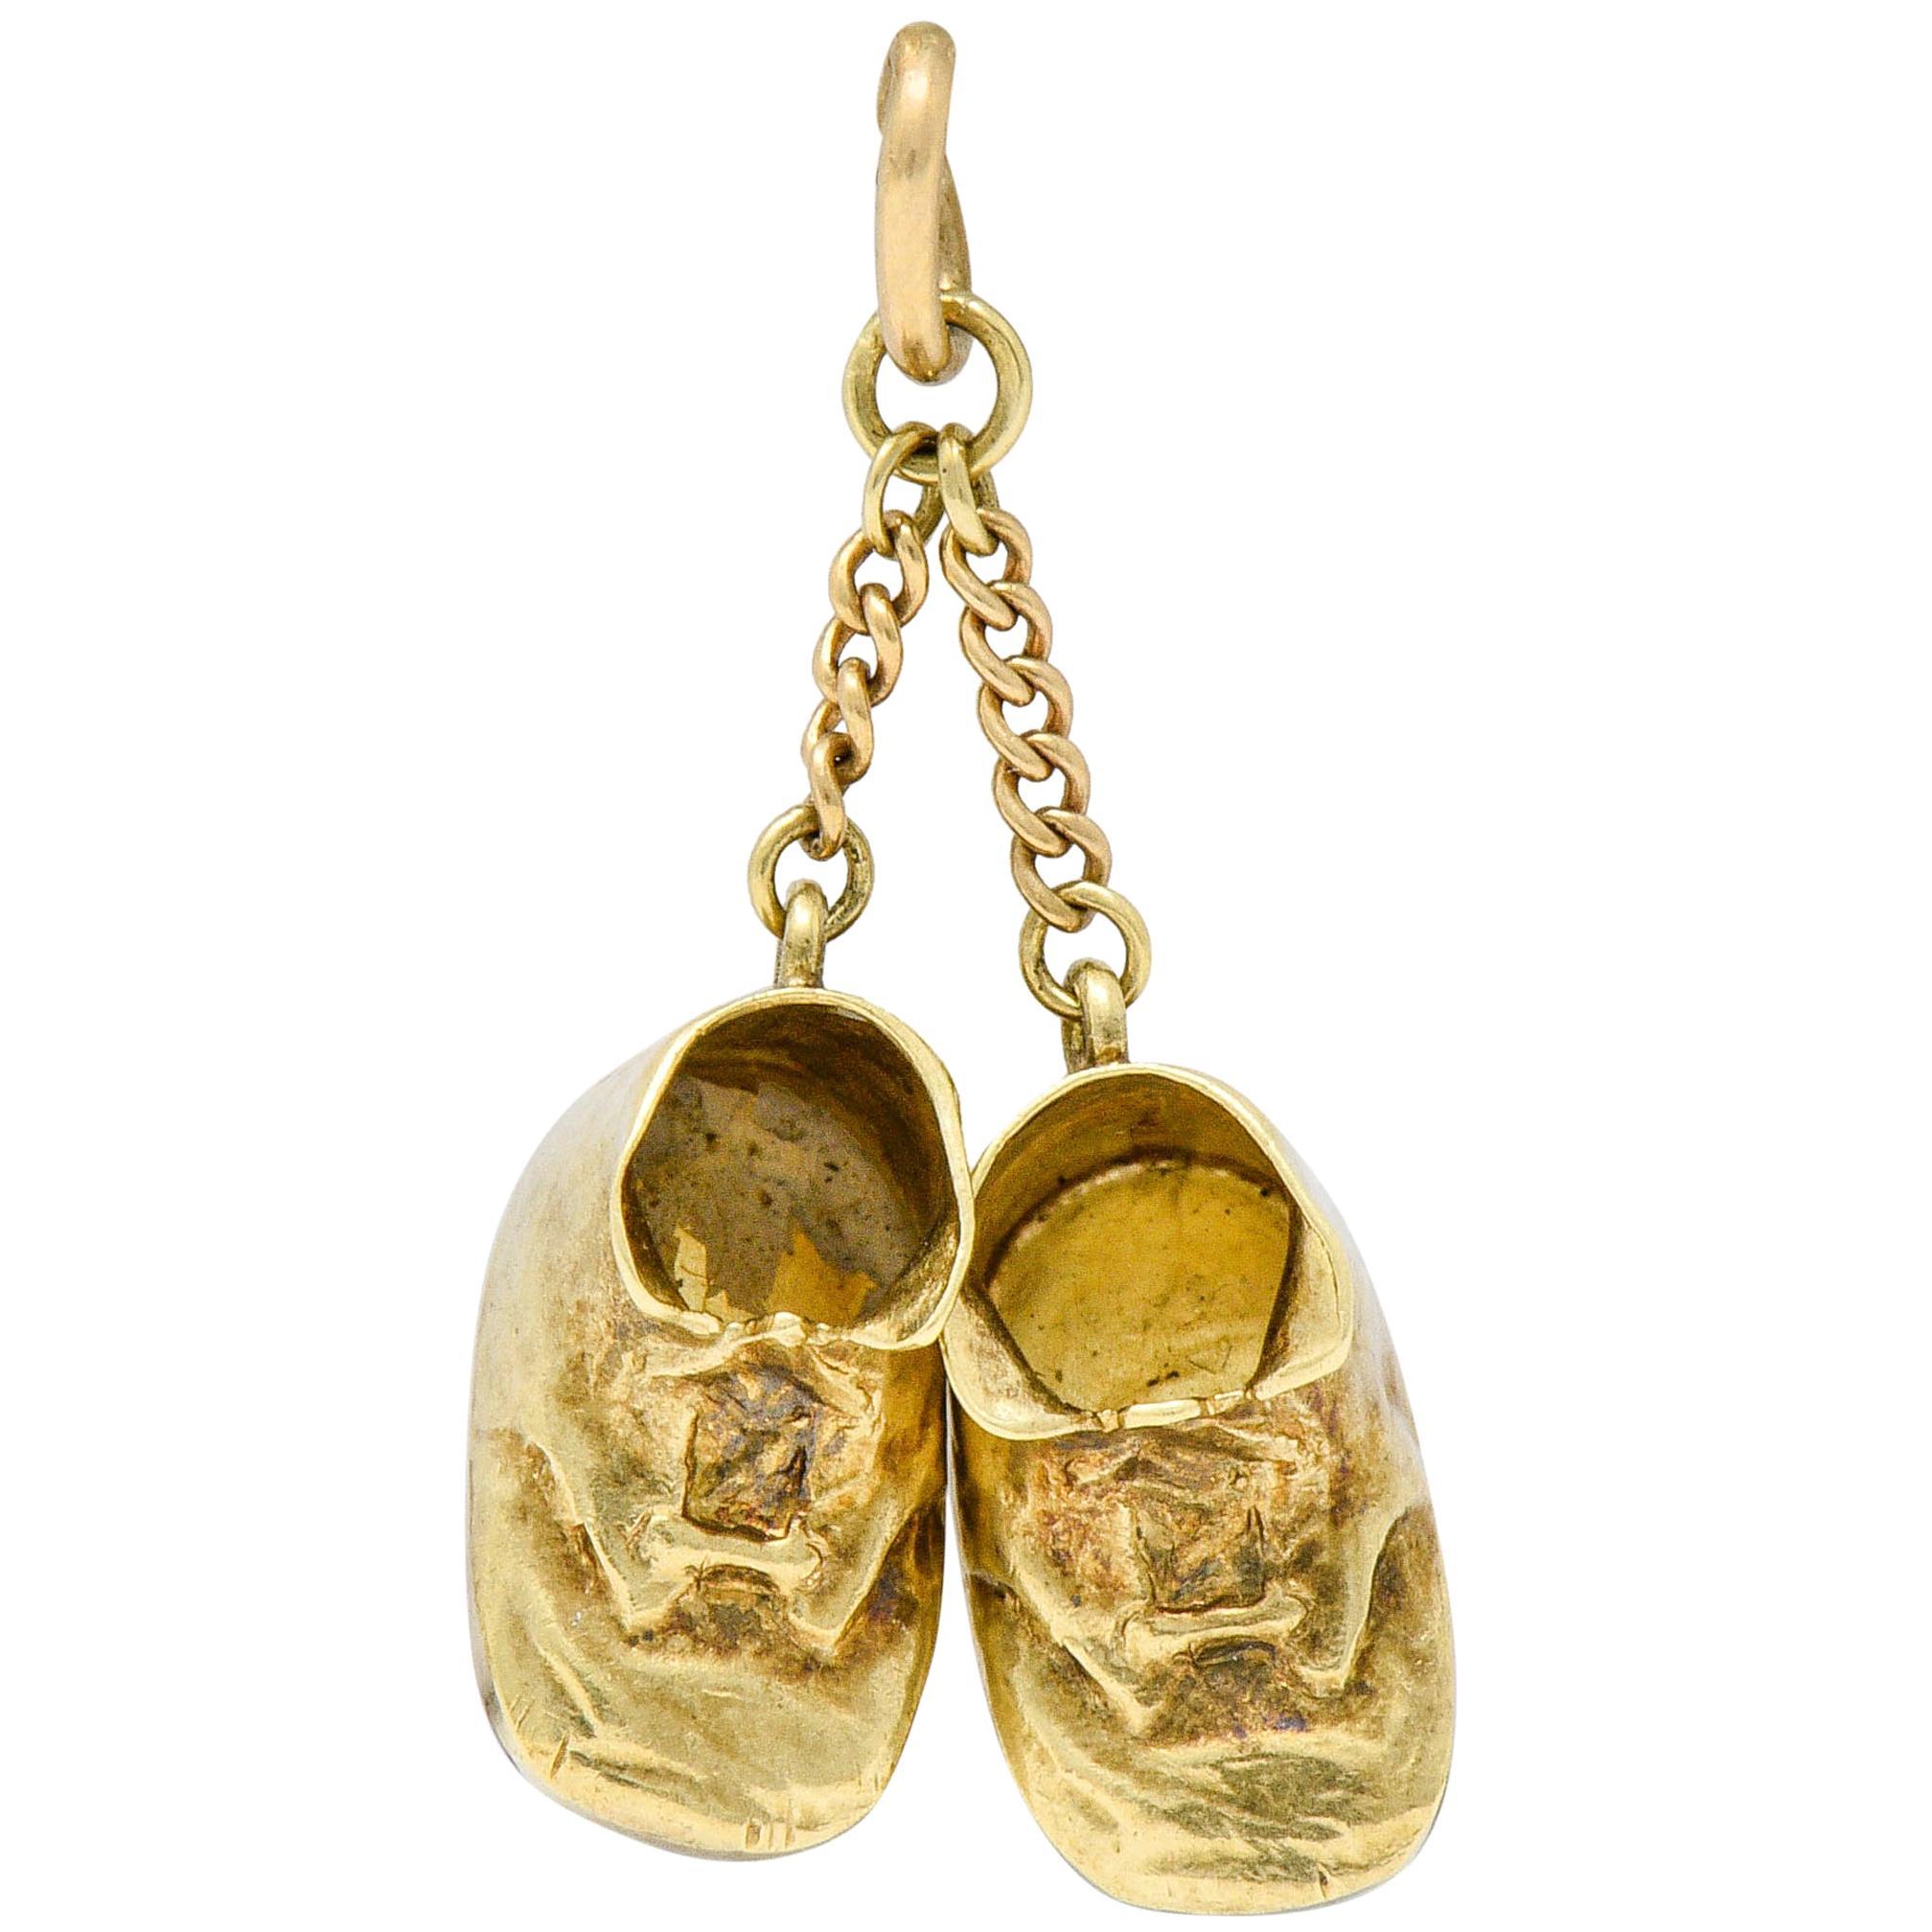 Sloan & Co. Retro 14 Karat Gold Baby Shoe Charm, circa 1940